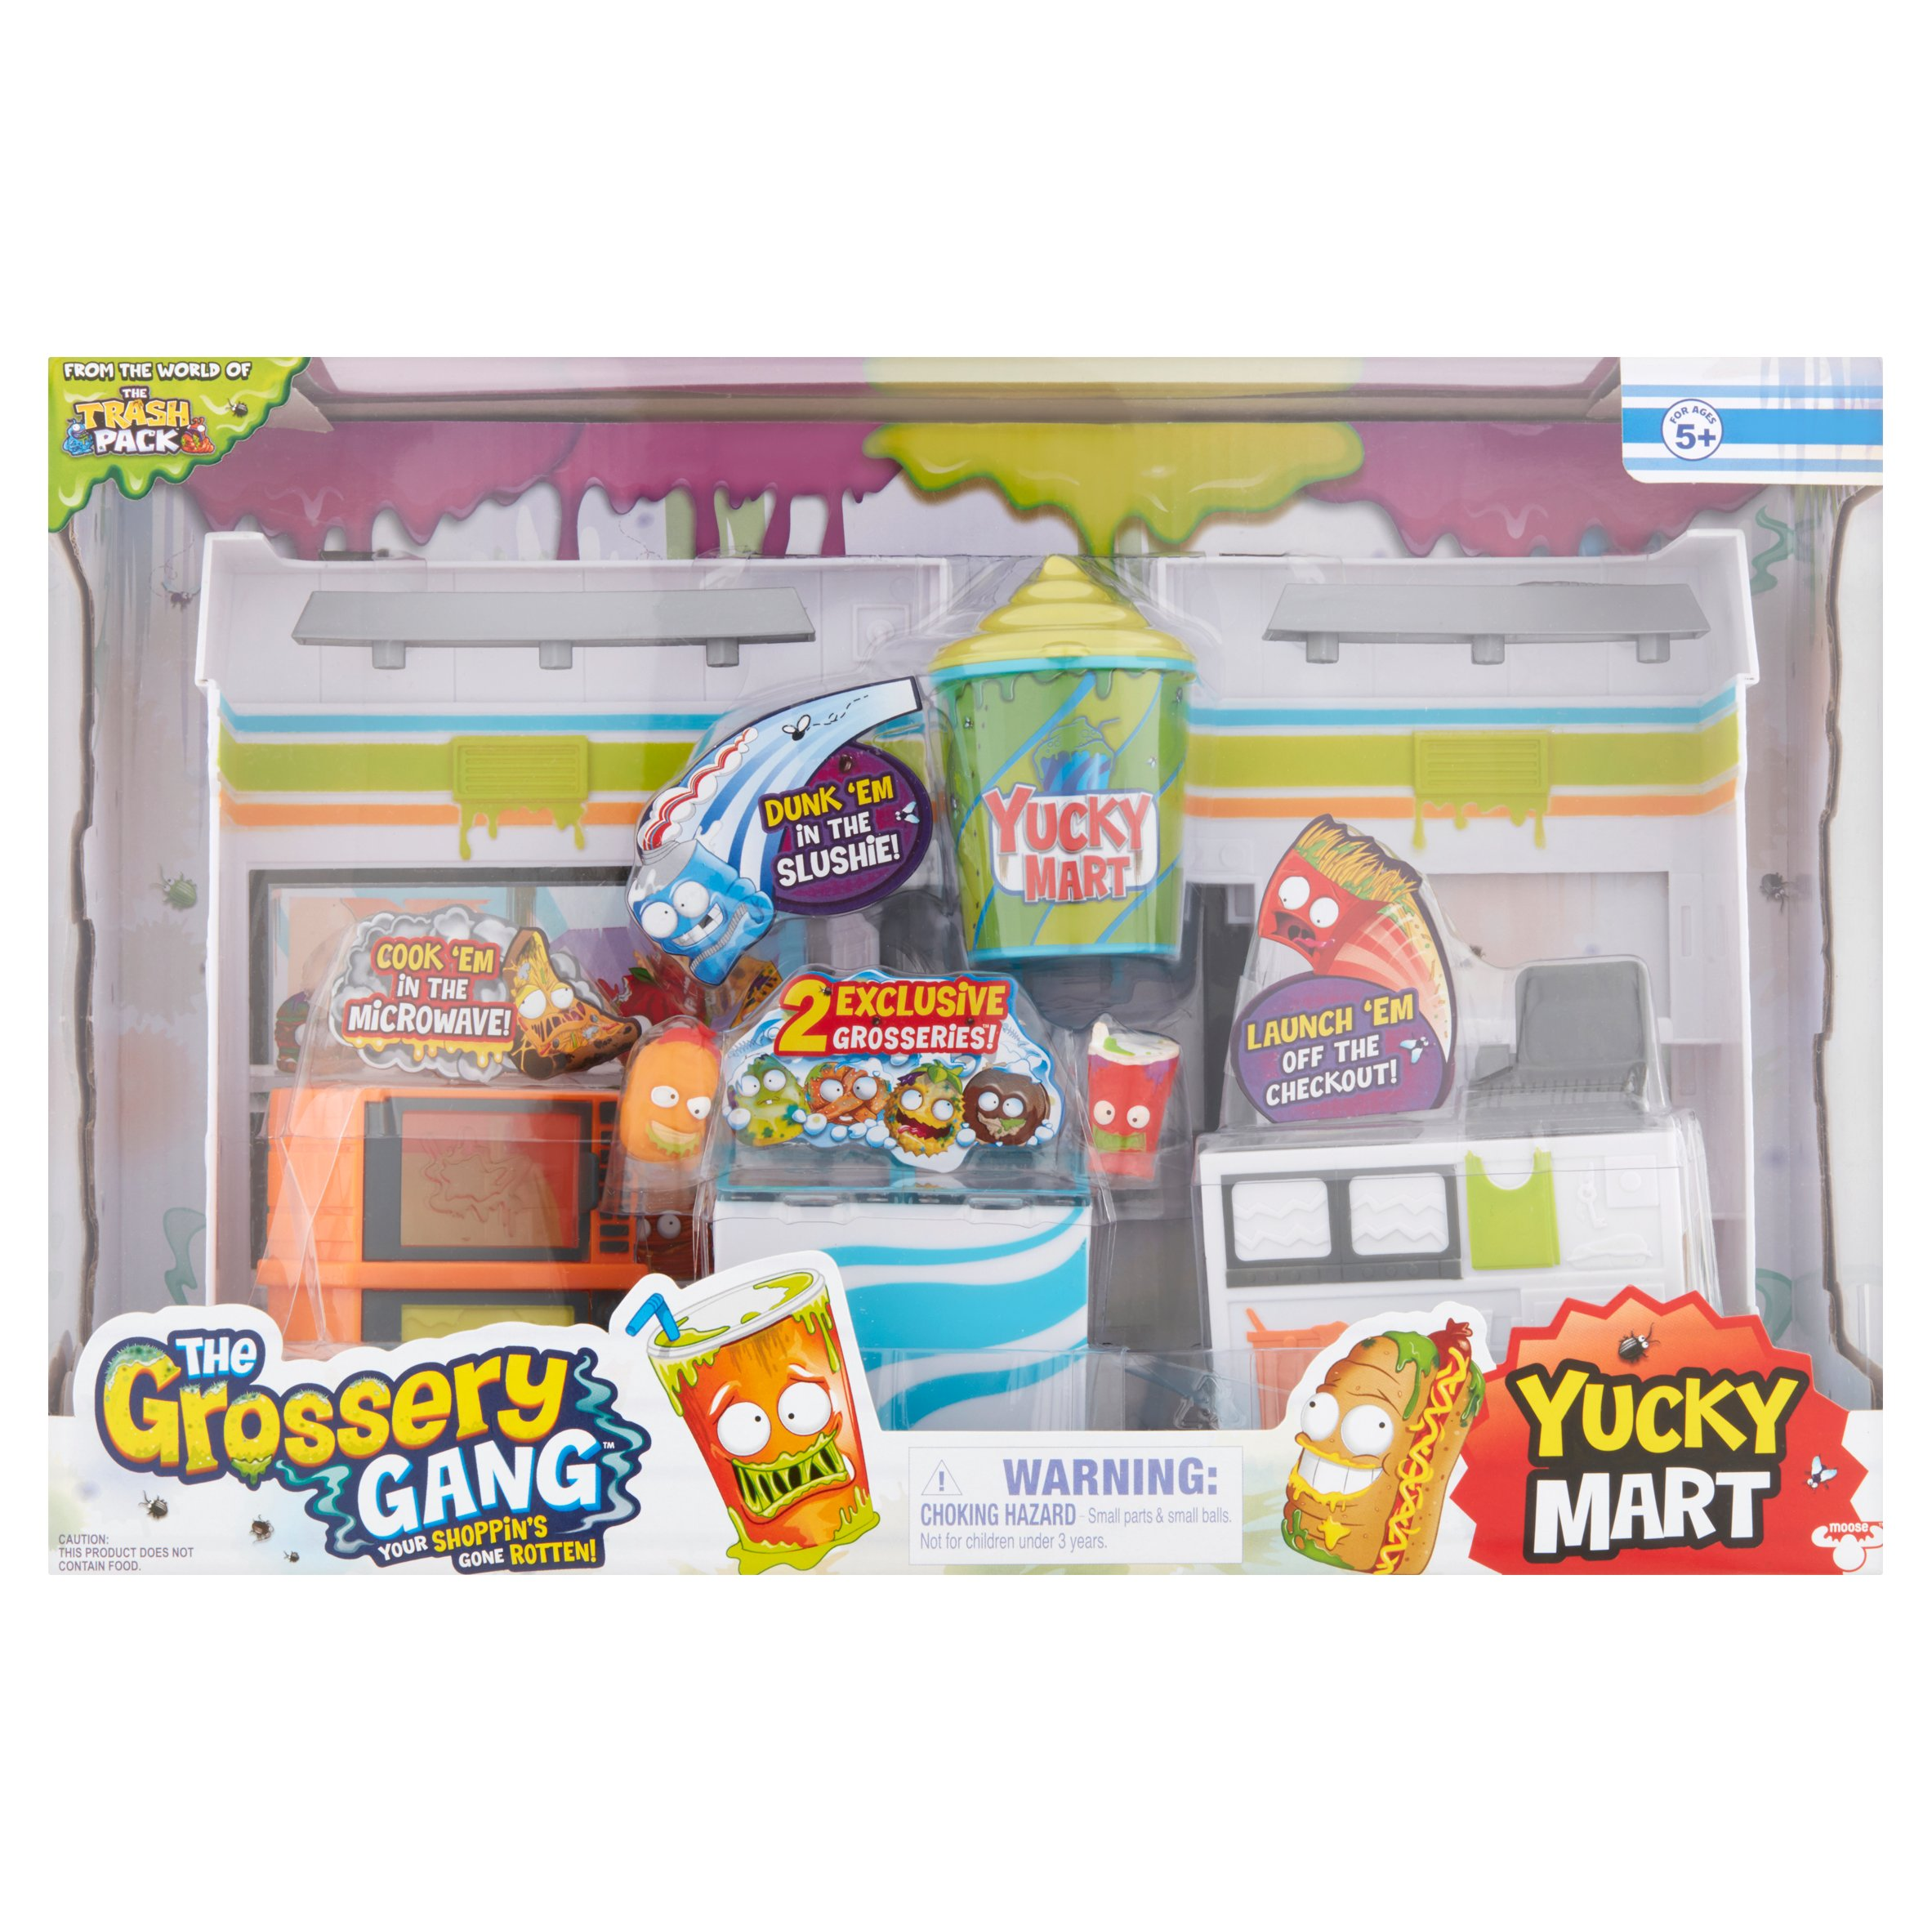 The Grossery Gang Yucky Mart Toys